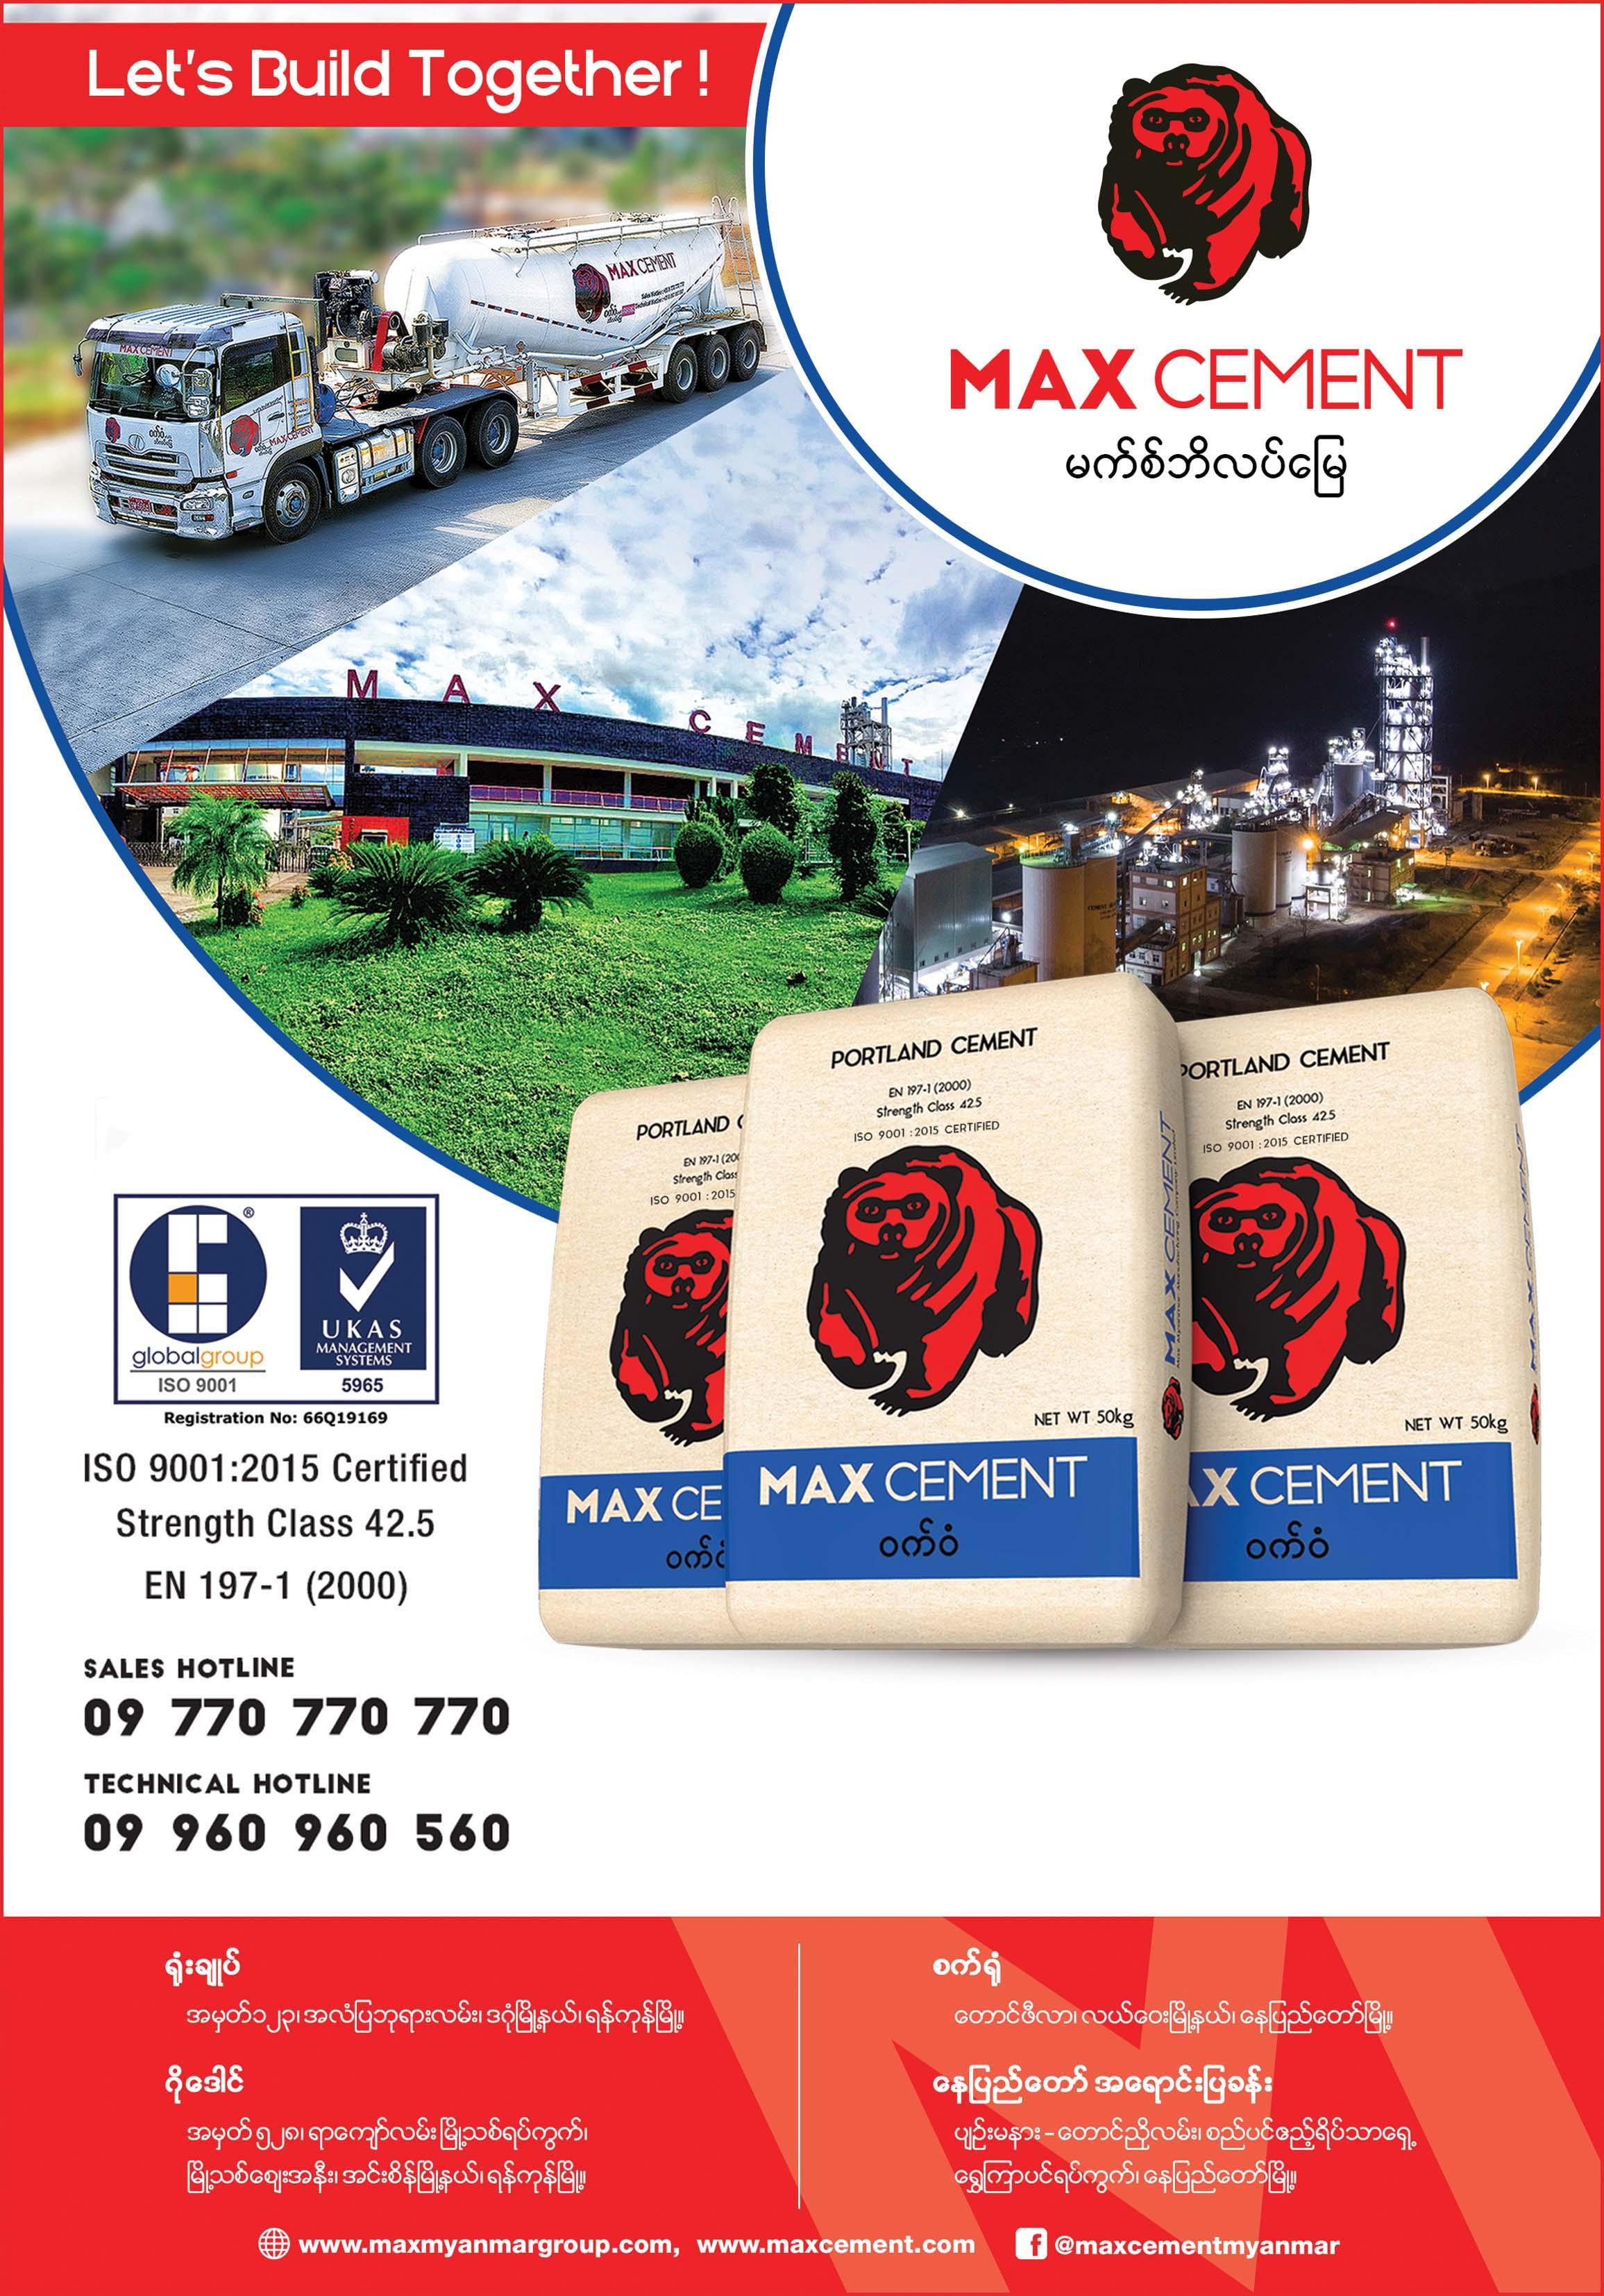 Max Cement